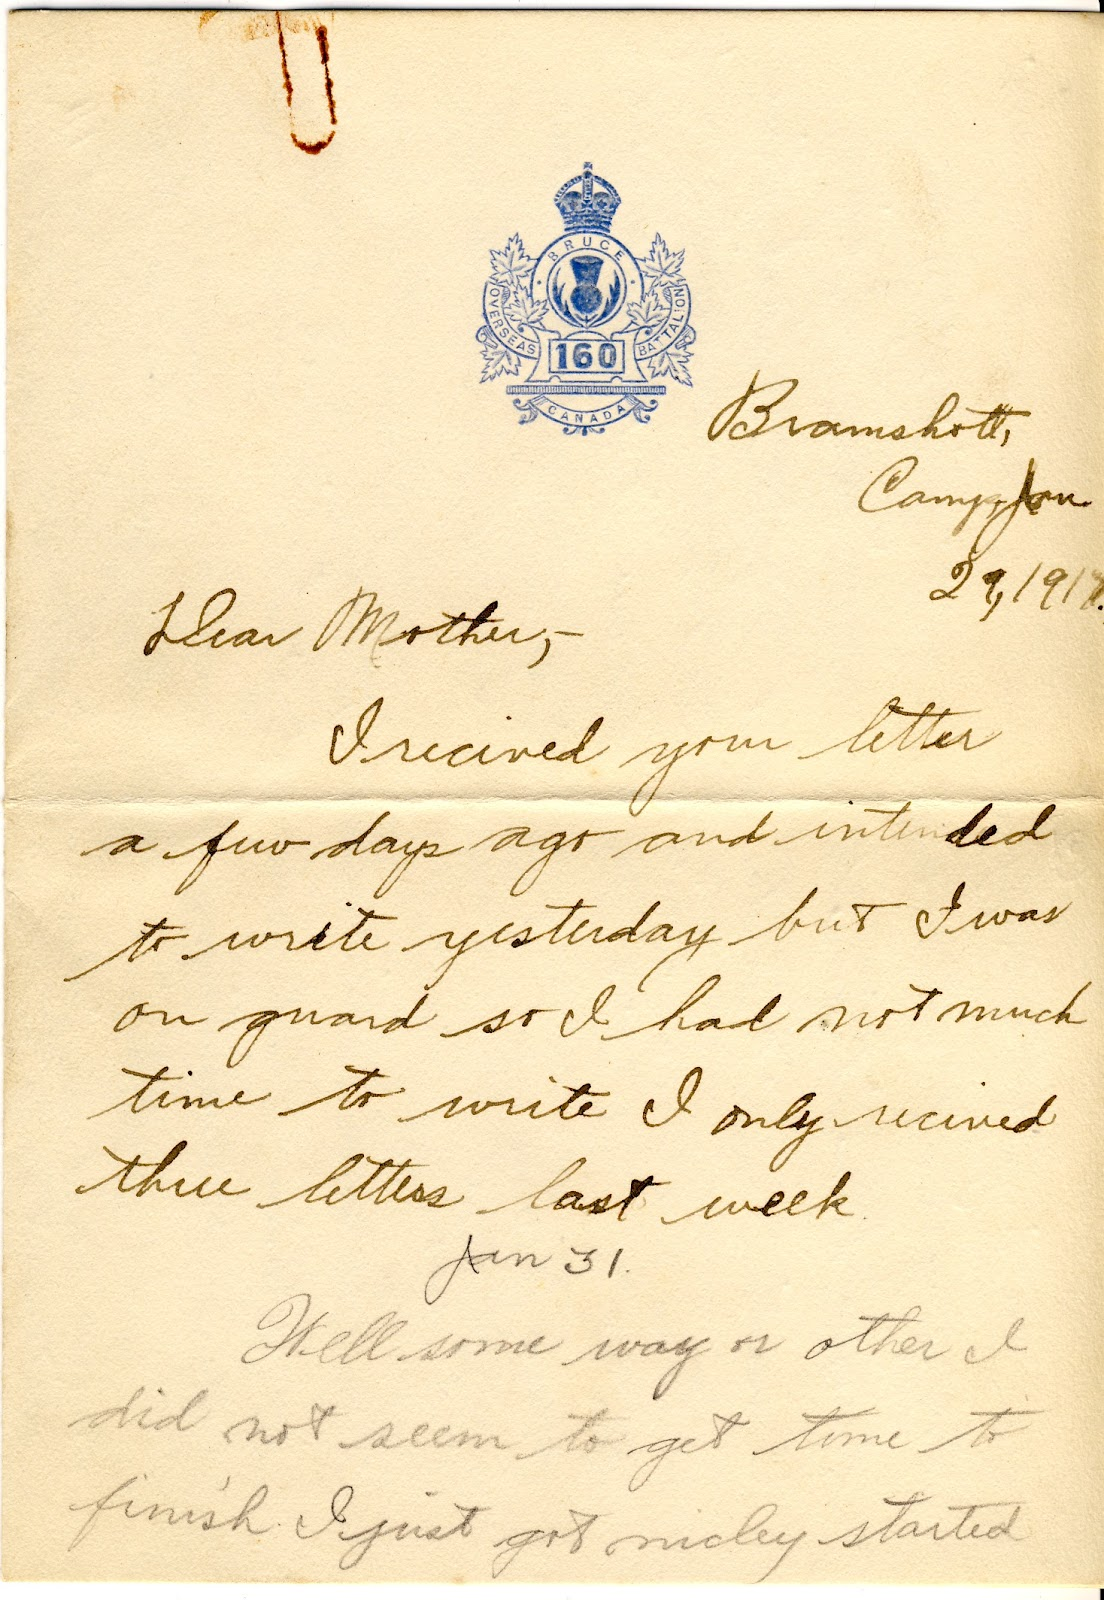 Letters From World War One Jan 29 Bramshott Camp